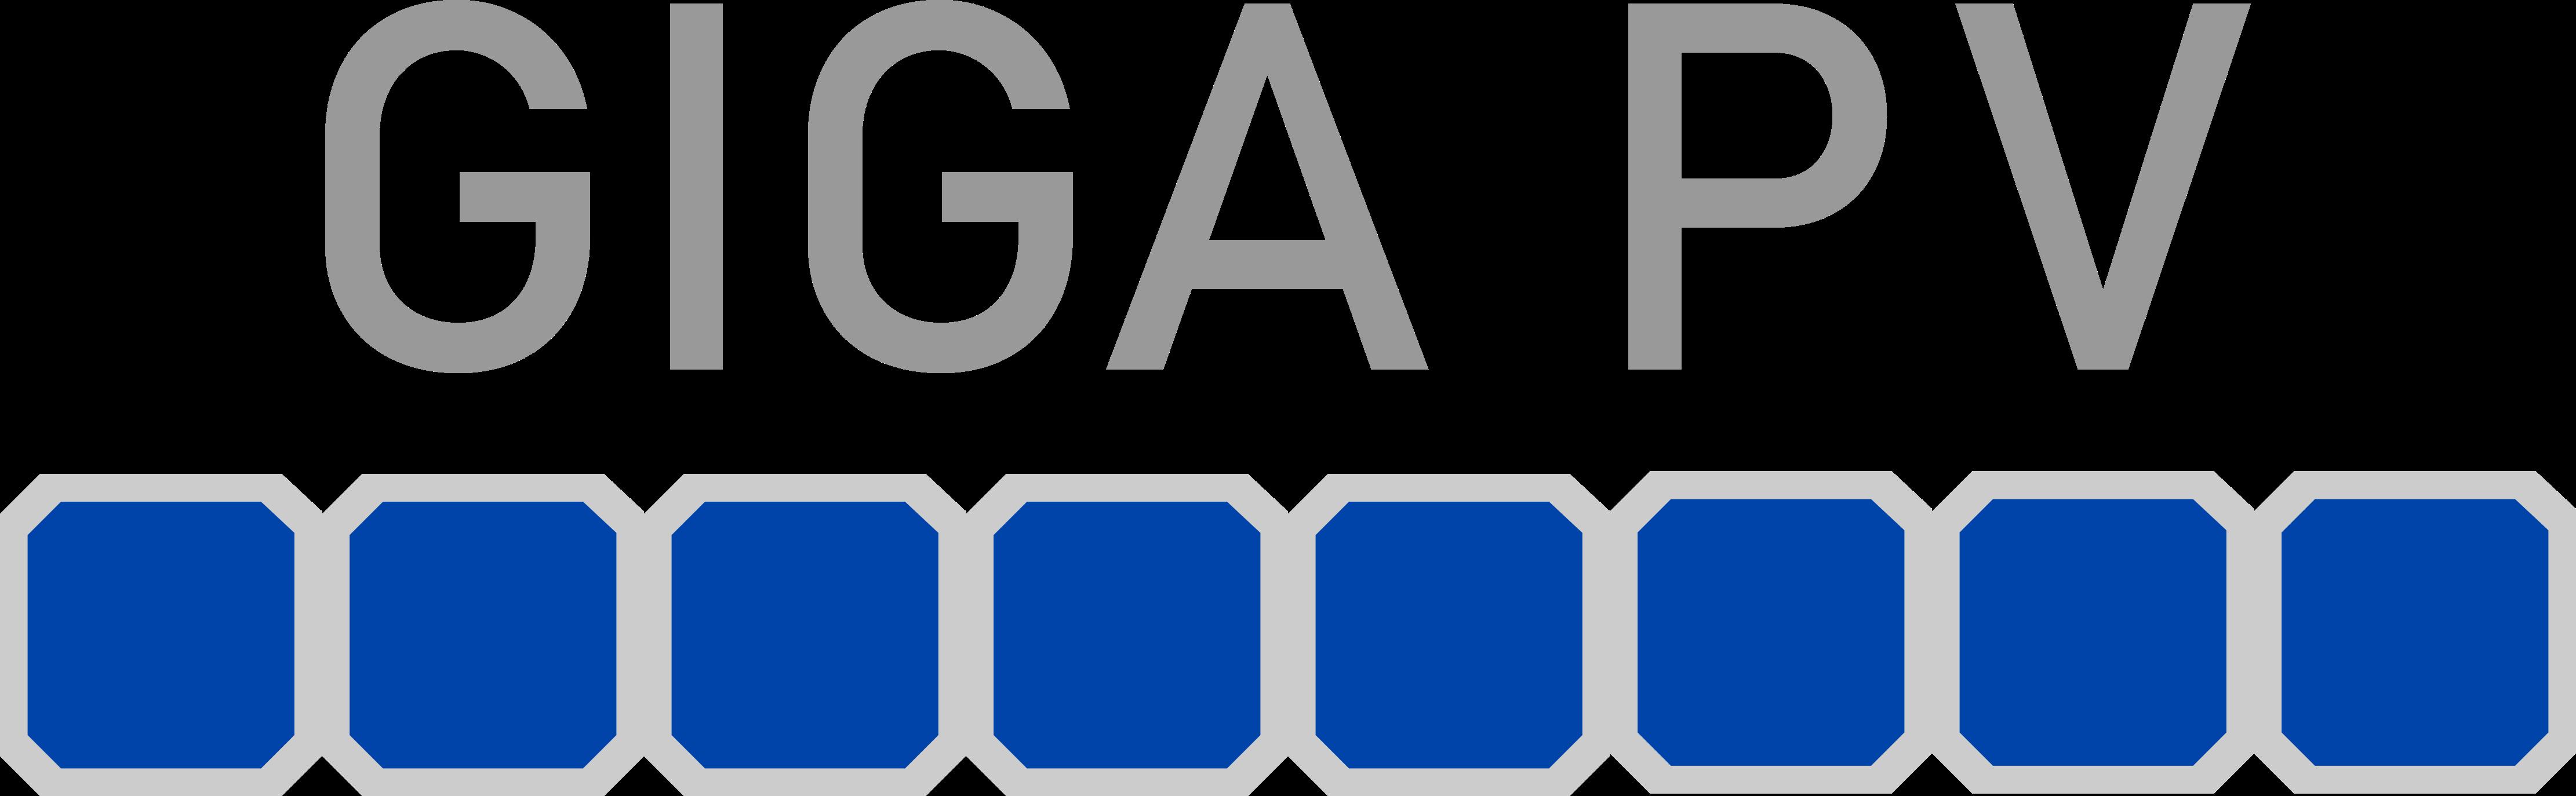 Giga PV